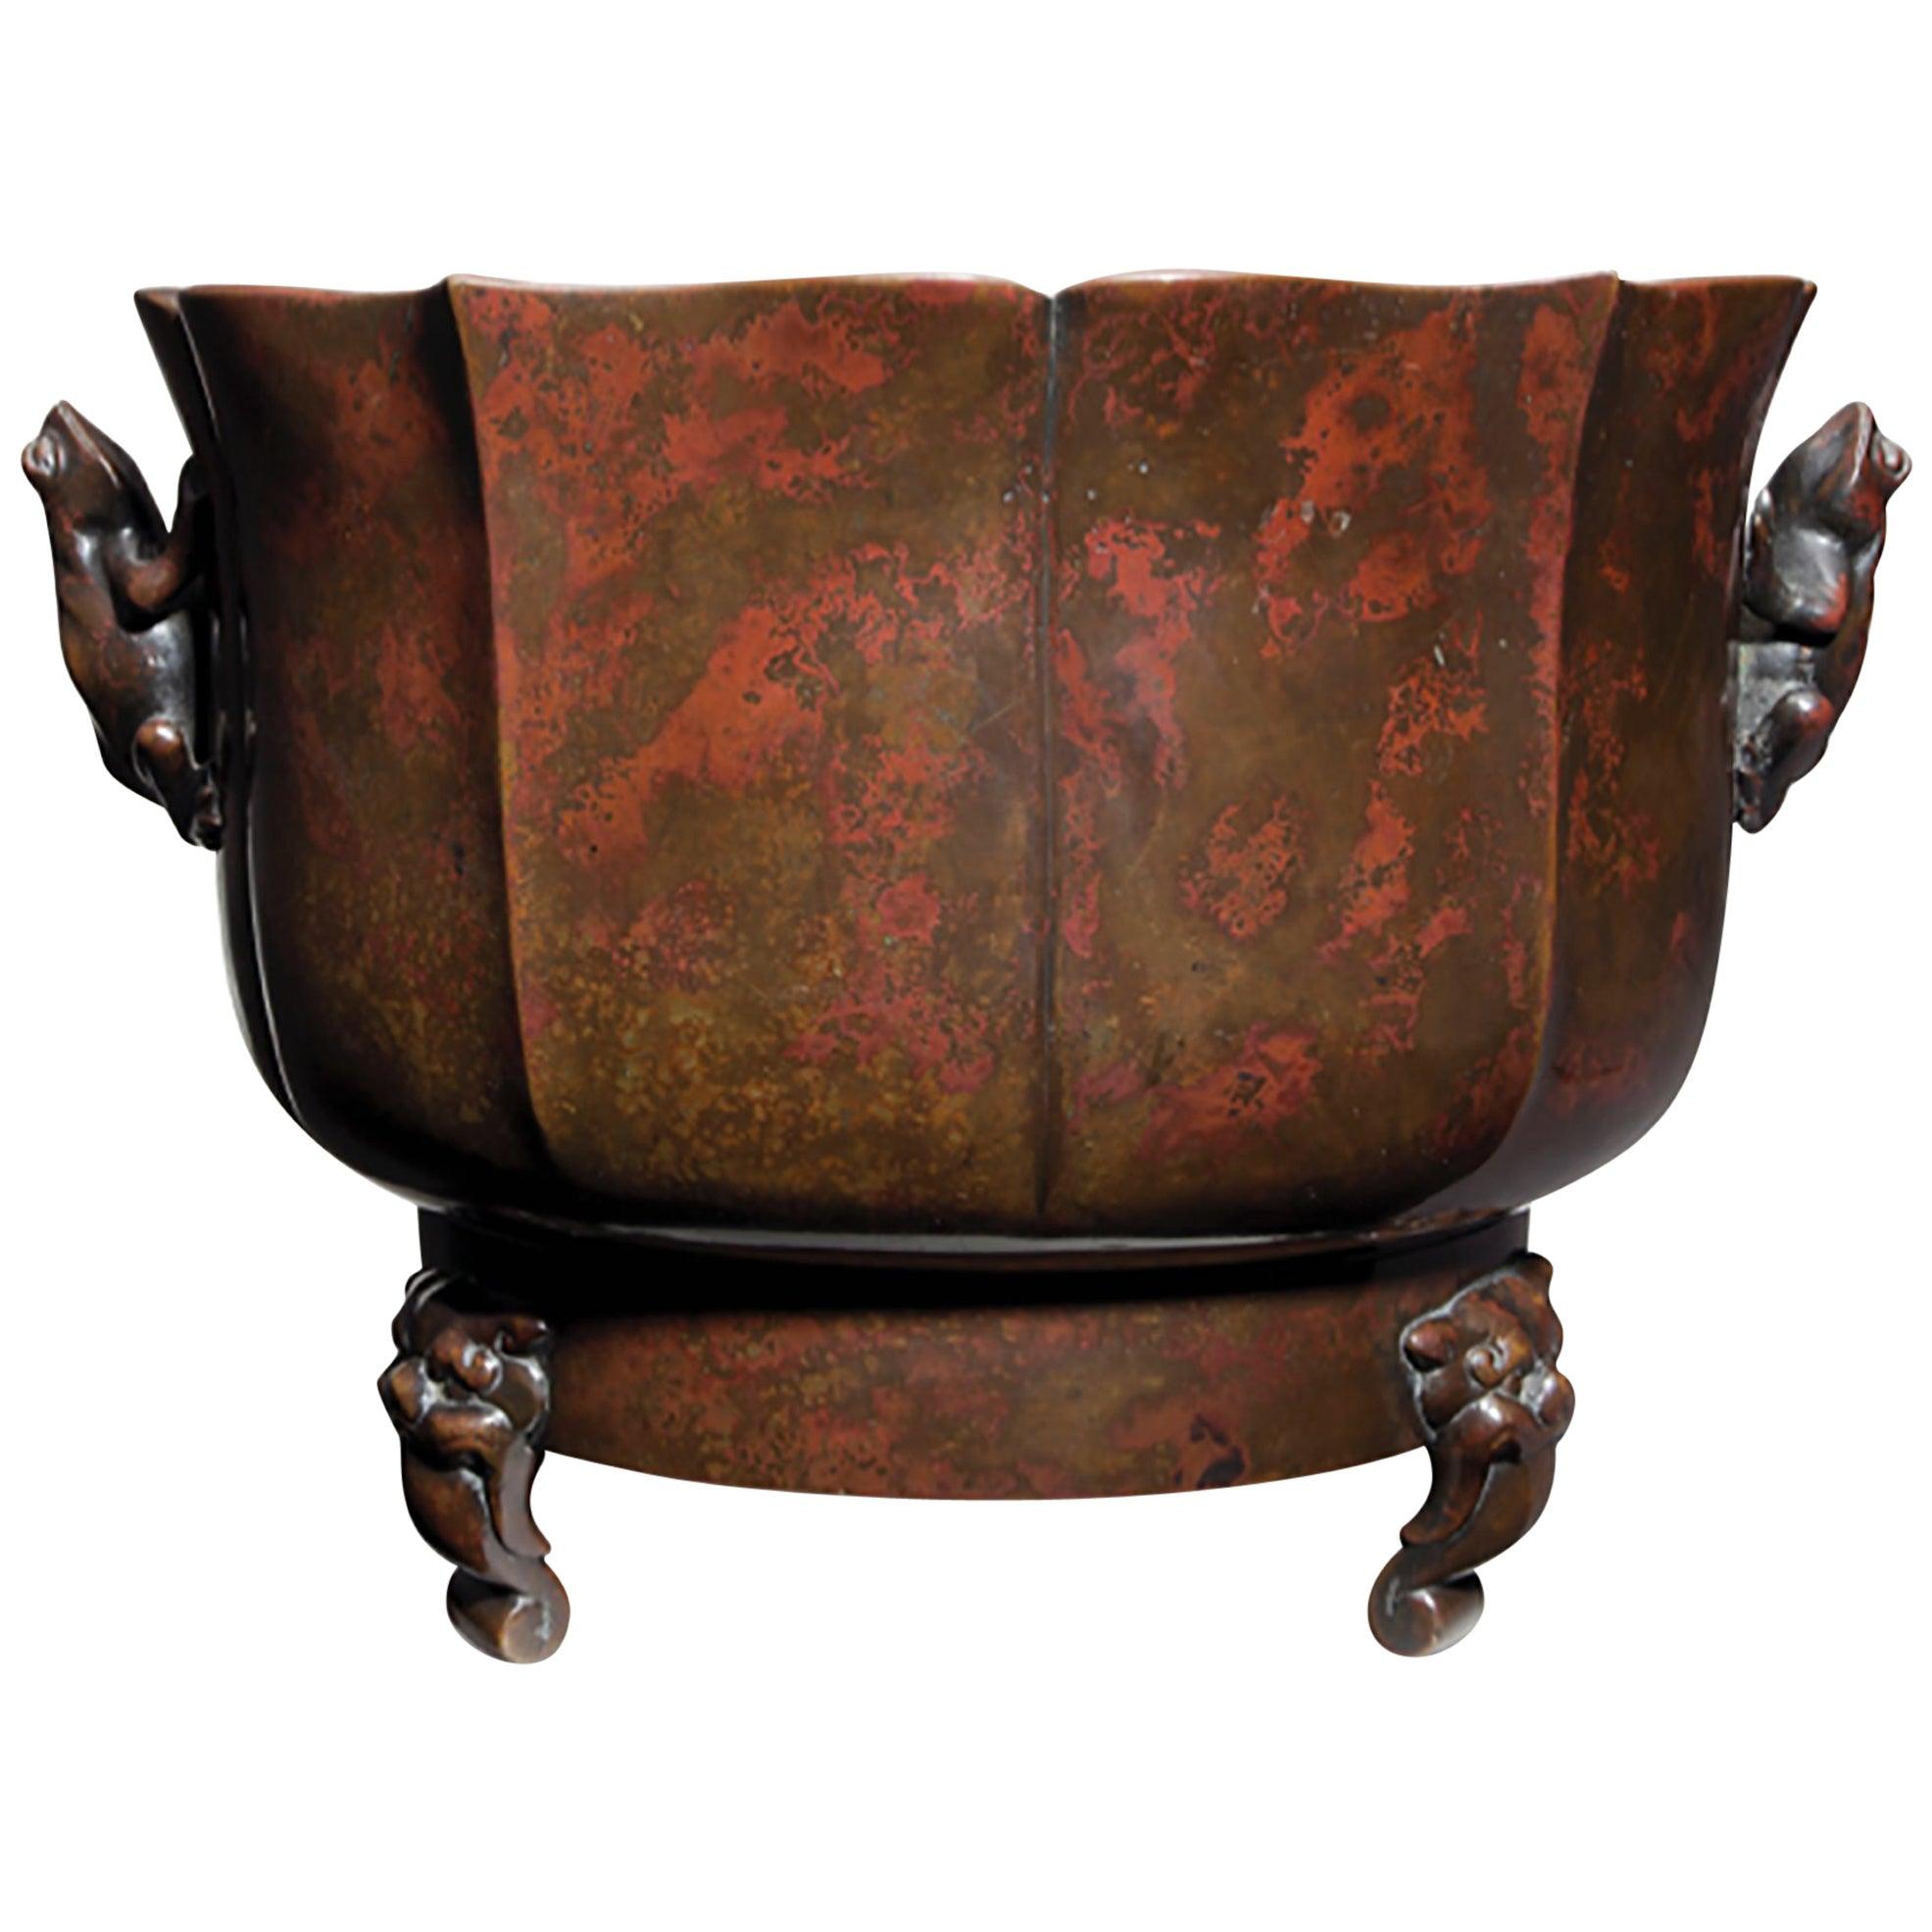 A Japanese Meiji Period Patinated Bronze Censer